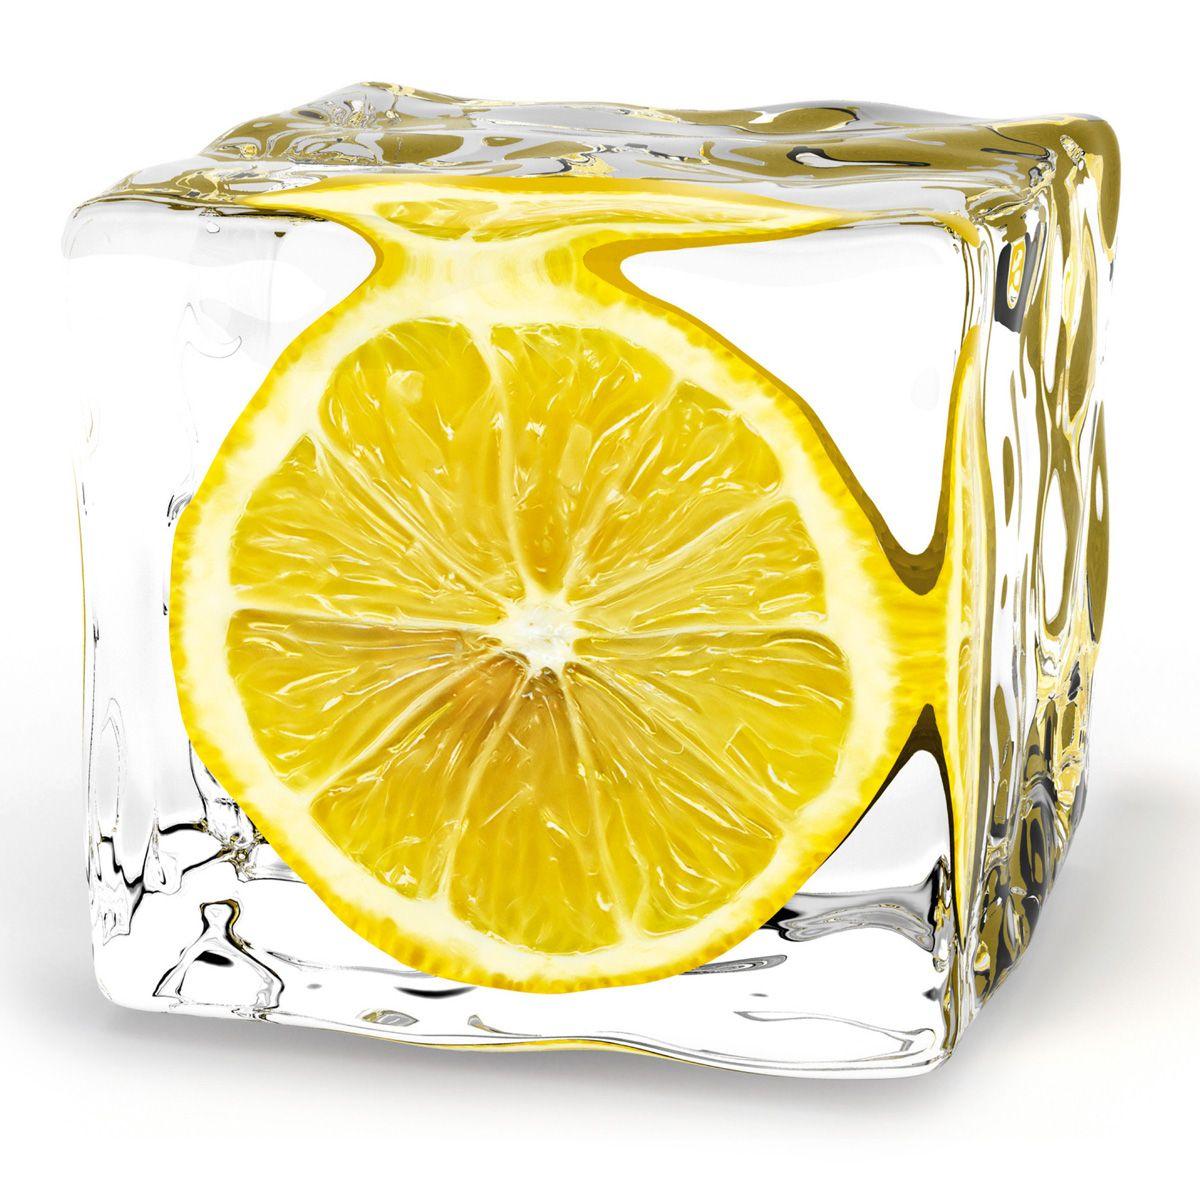 Deco Glass Wall Decor - Iced Lemon $59.99 | Platin Art\'s Wall Decor ...